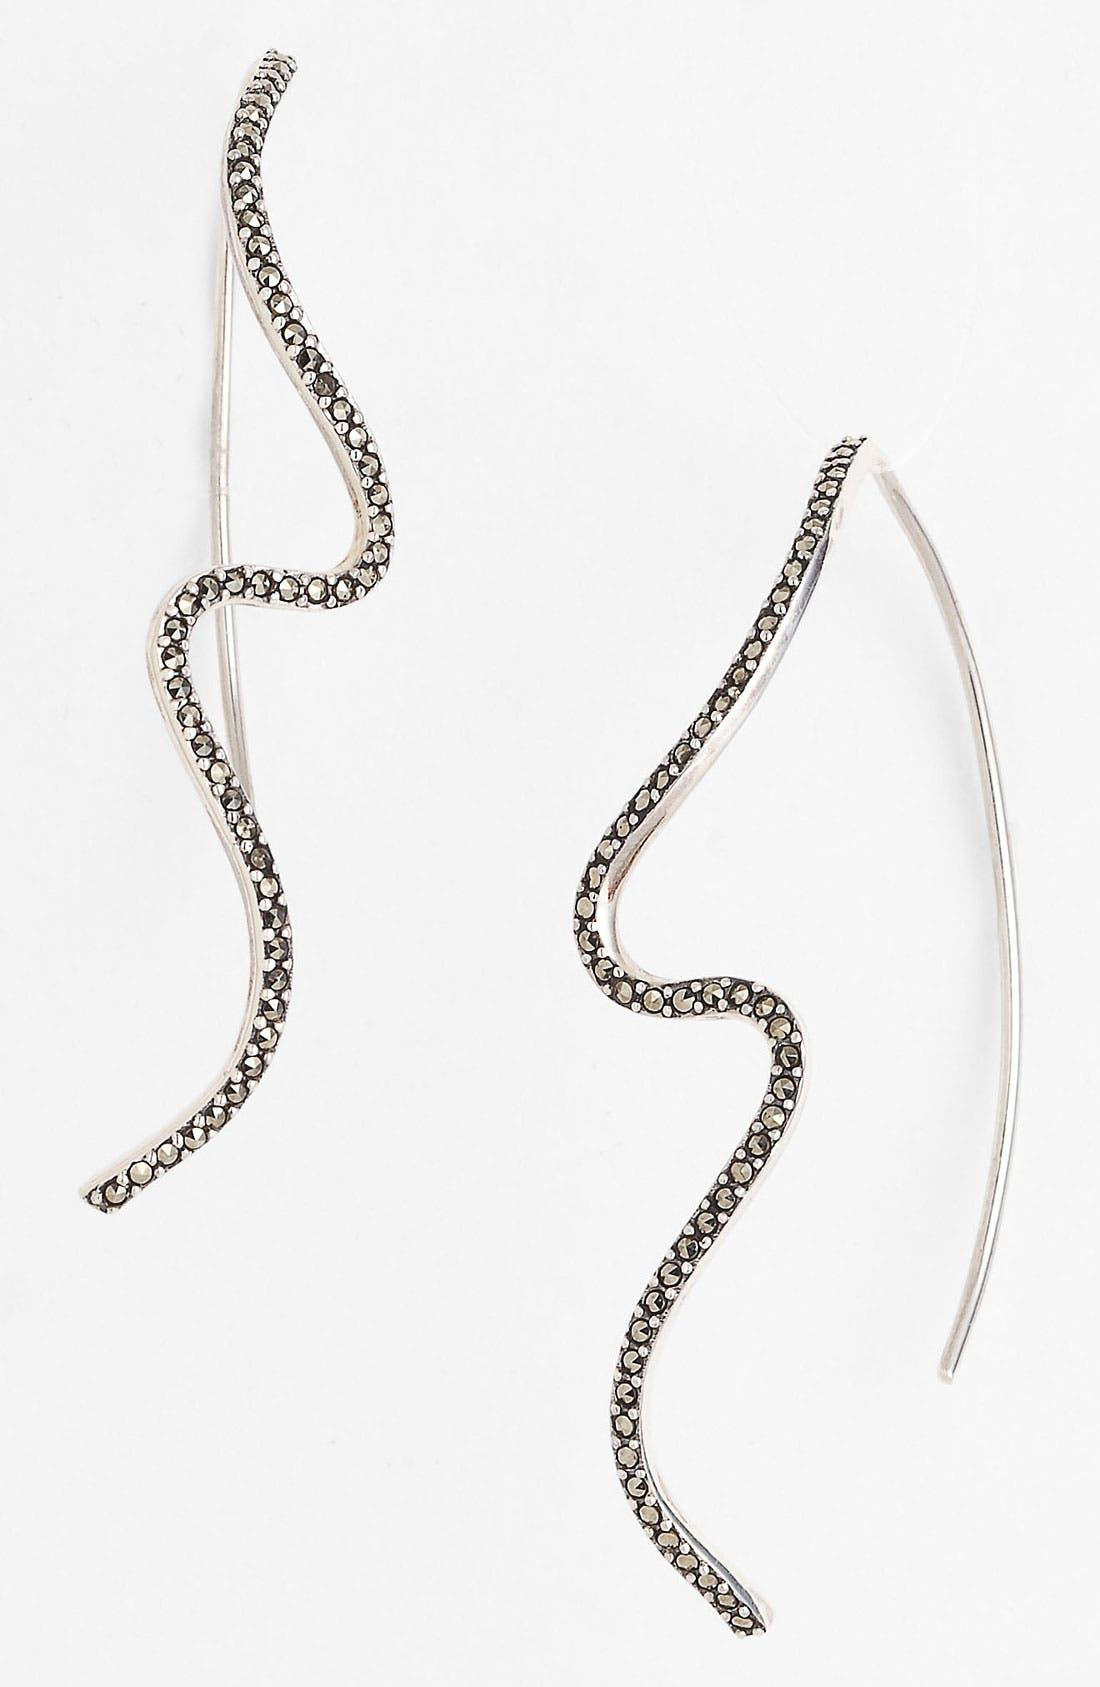 Alternate Image 1 Selected - Judith Jack 'Fluidity' Linear Earrings